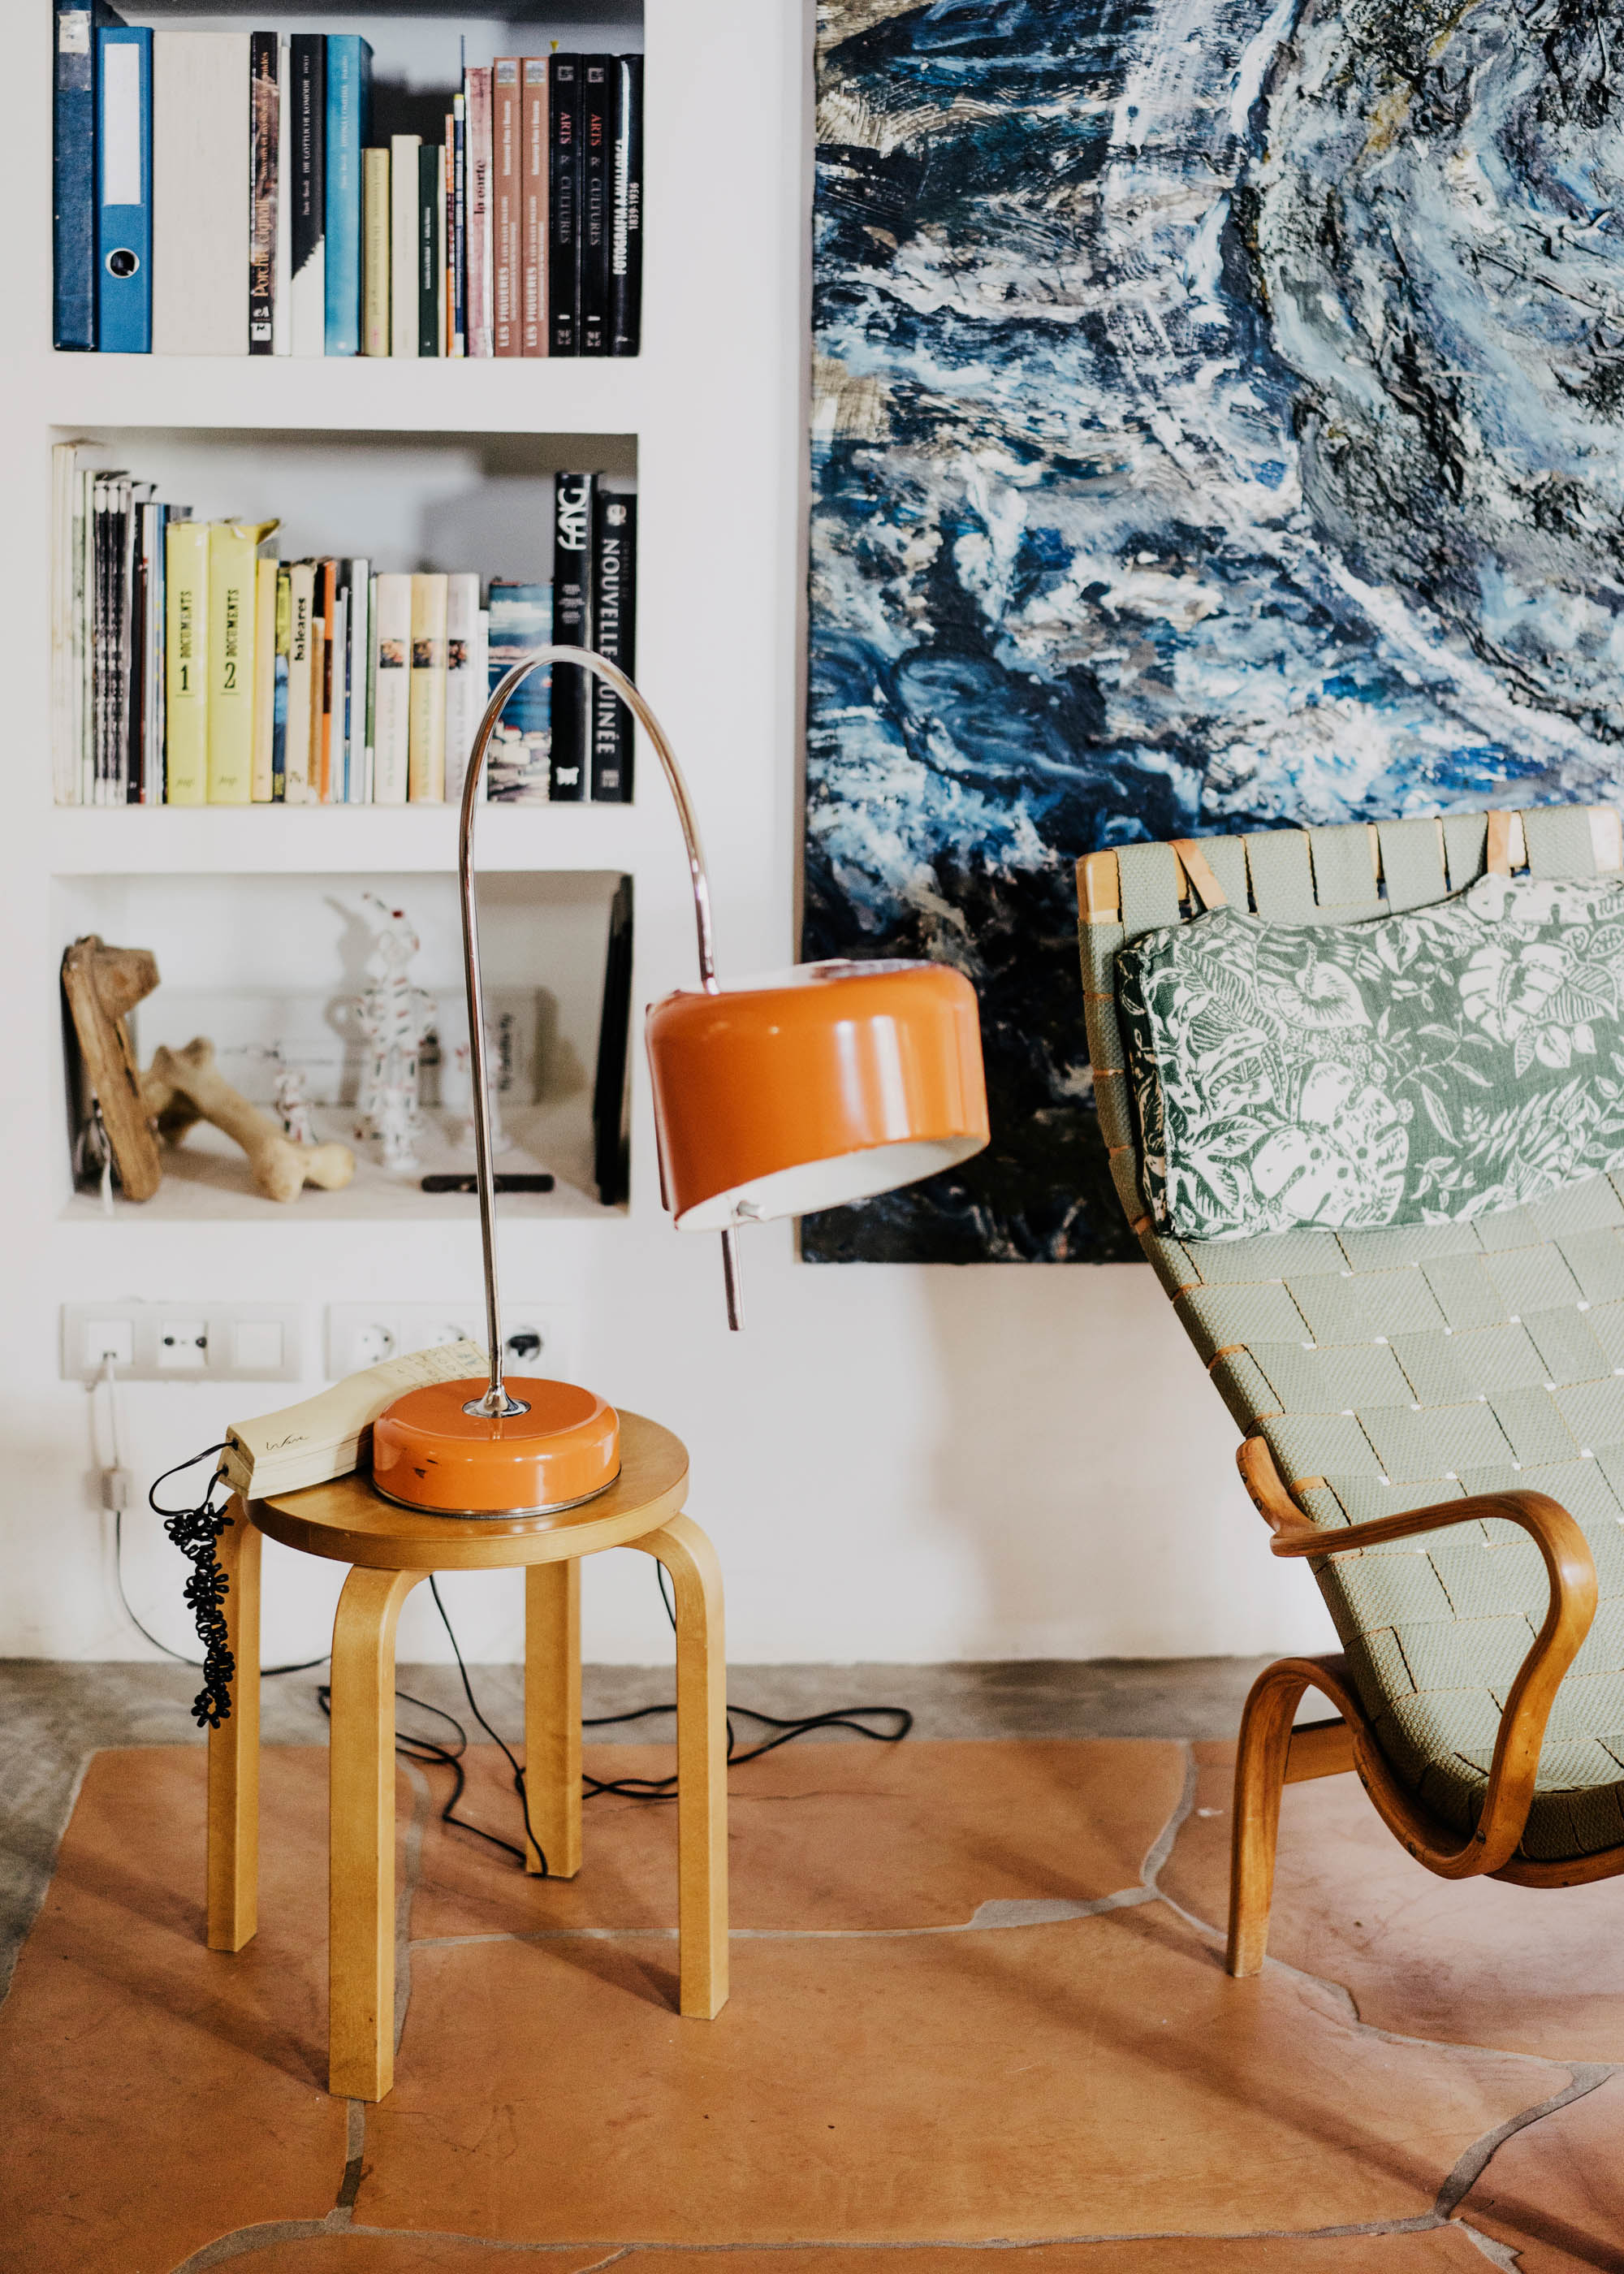 #interiors #miquelbarcelo #artist #spain #mallorca #editorial #wallstreetjournal